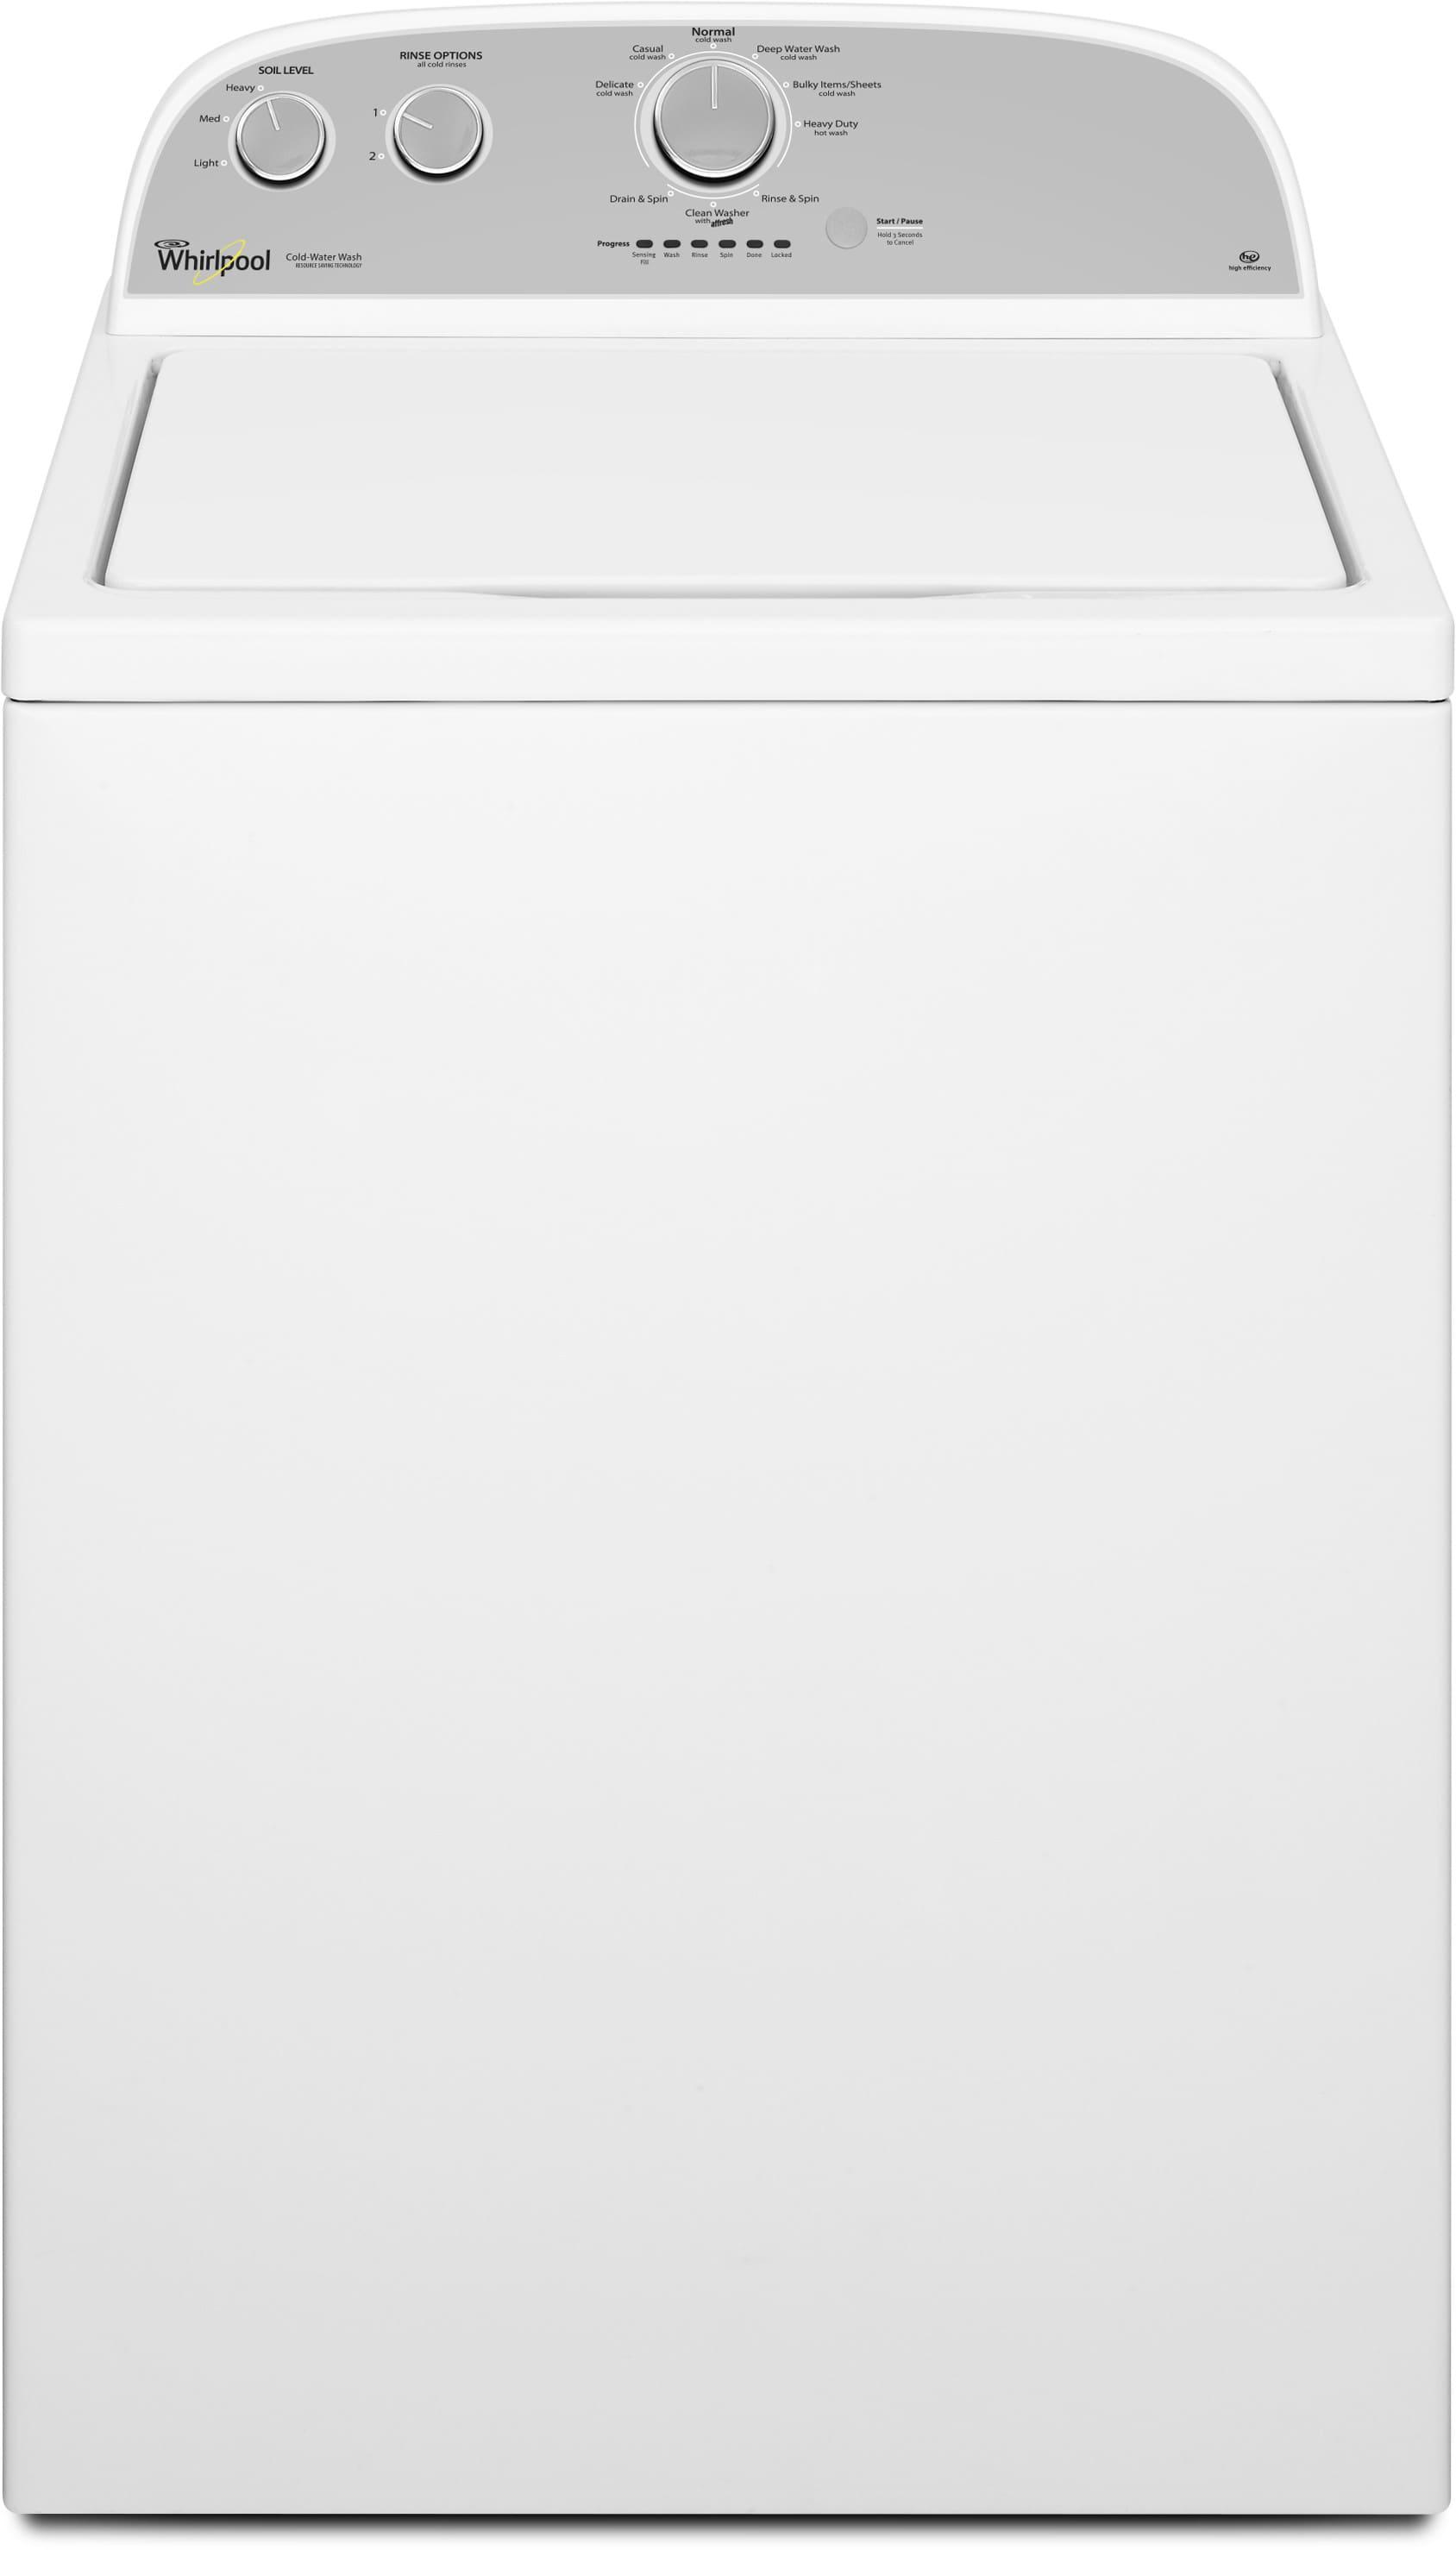 Whirlpool Wtw4715ew 27 Inch 3 5 Cu Ft Top Load Washer